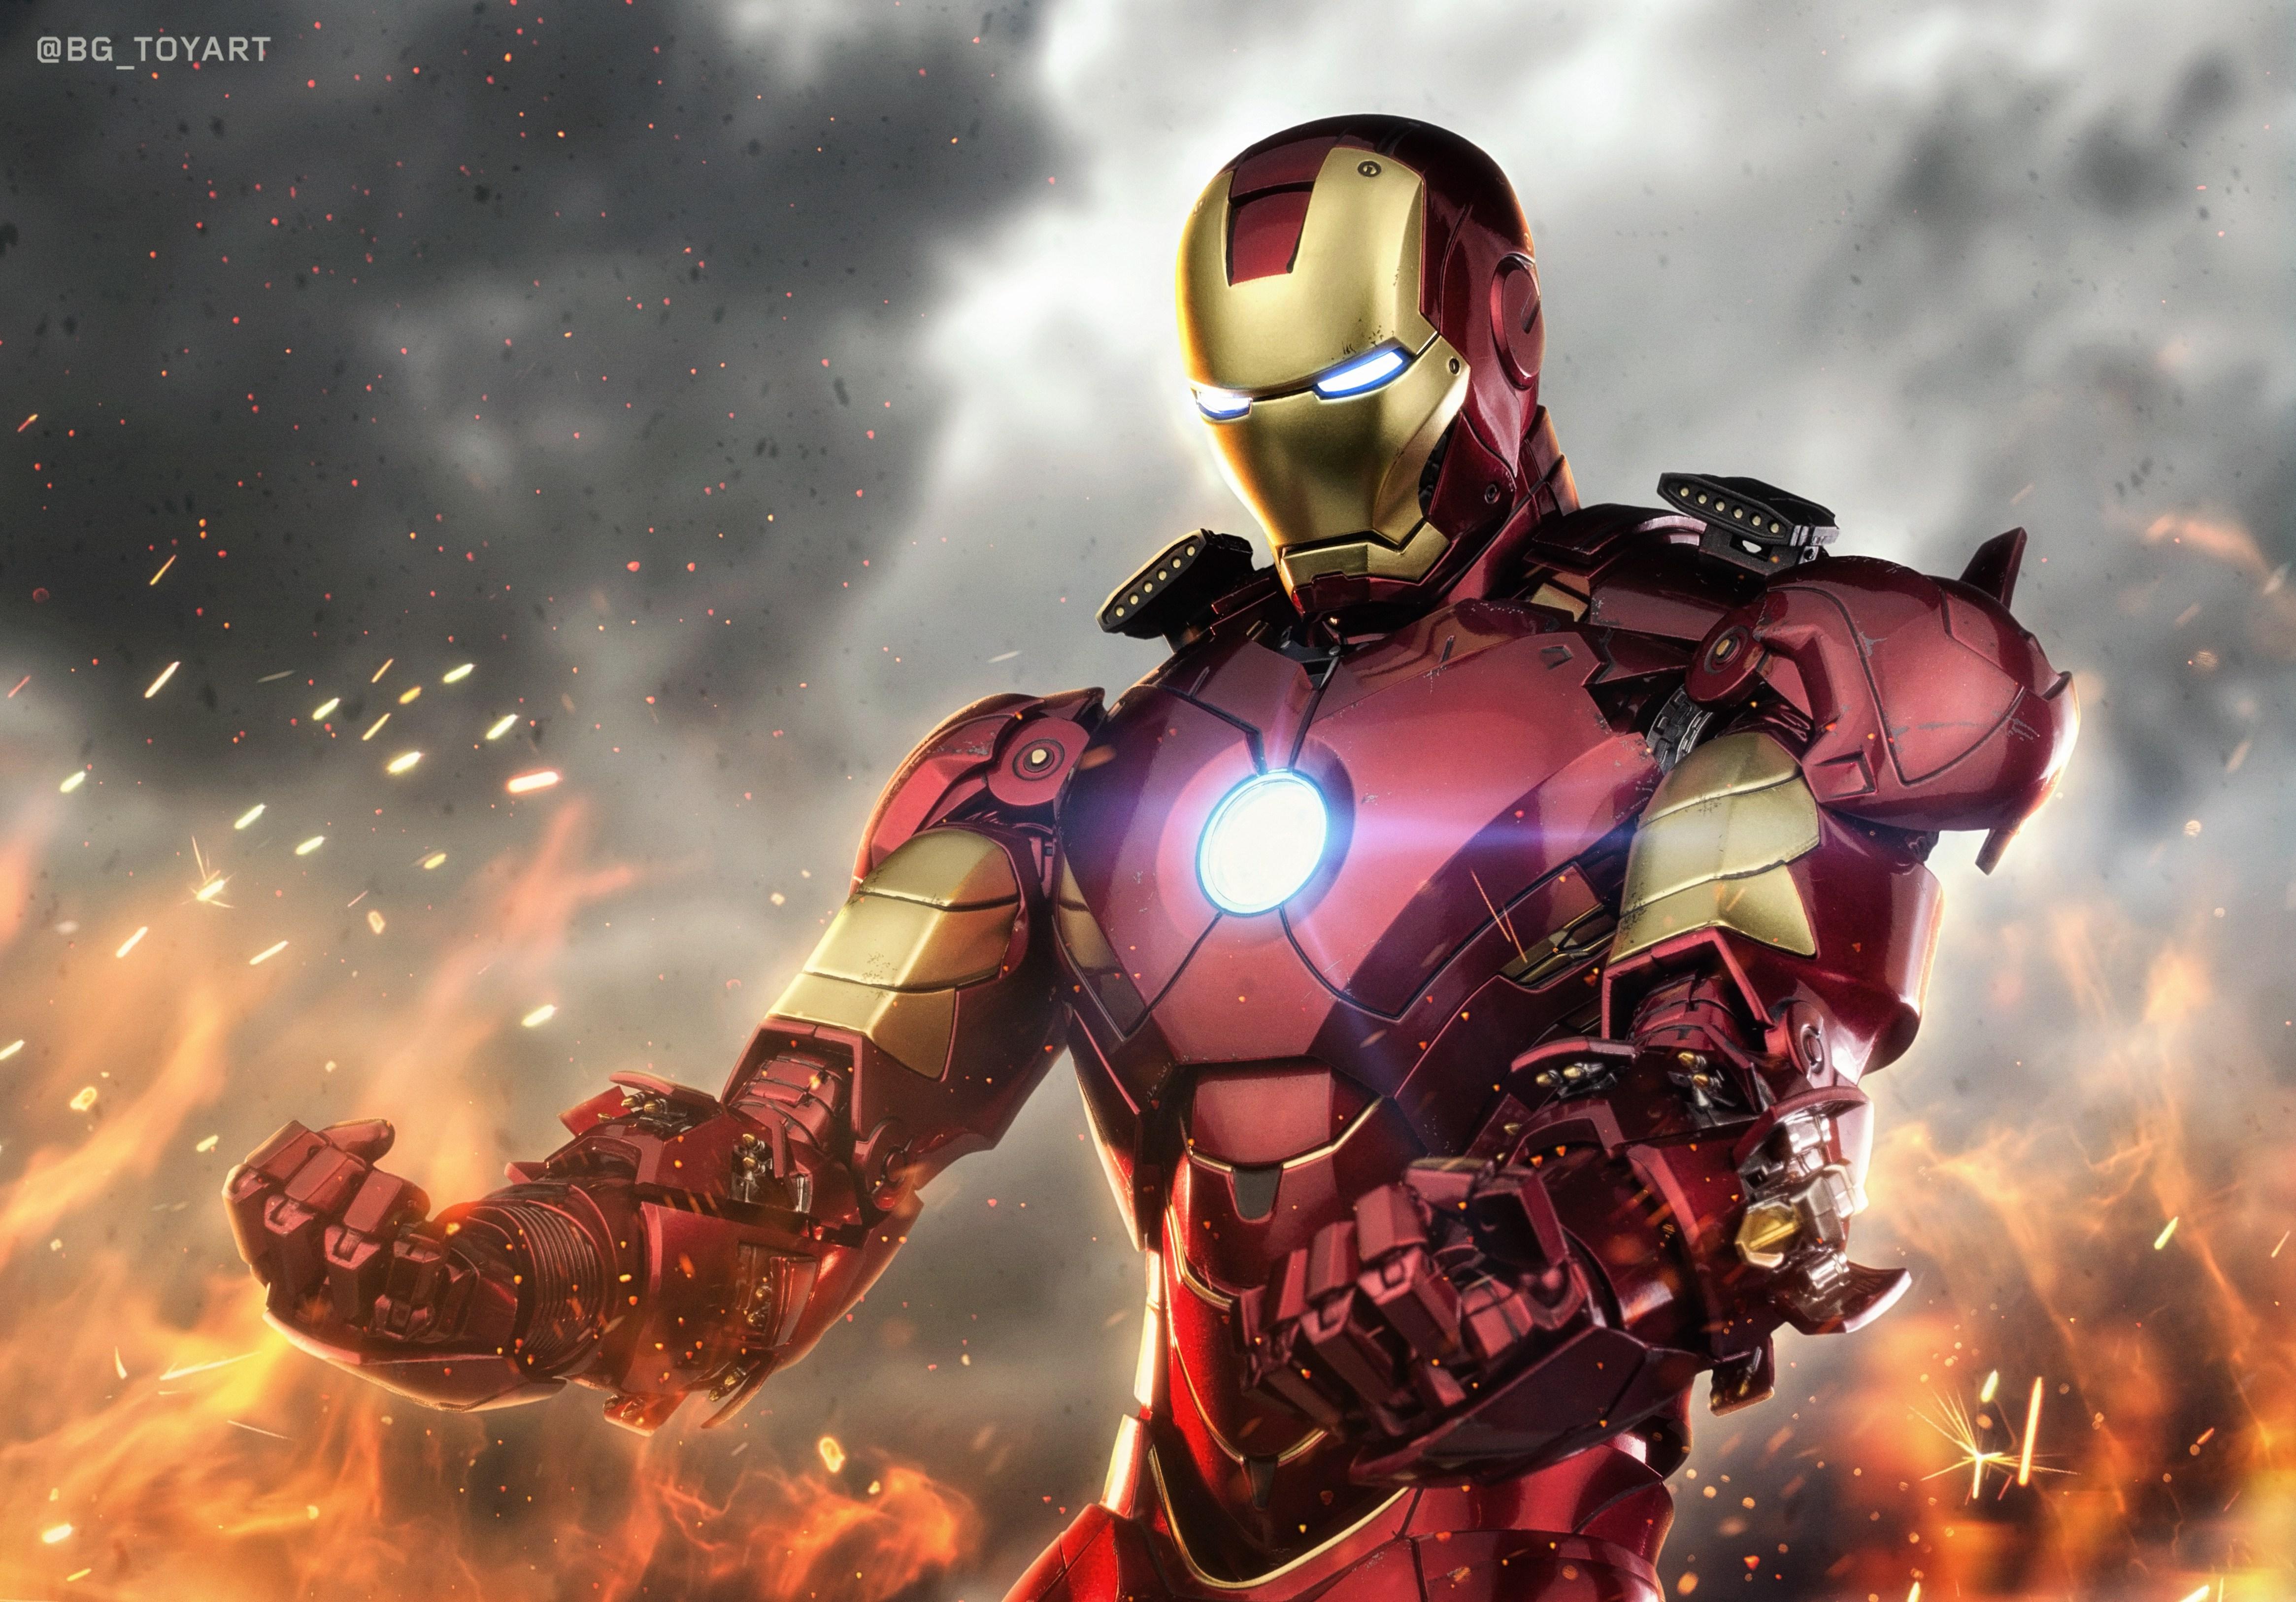 Iron man 4k ultra hd wallpaper background image 4661x3252 id 971650 wallpaper abyss - Iron man wallpaper 4k ...